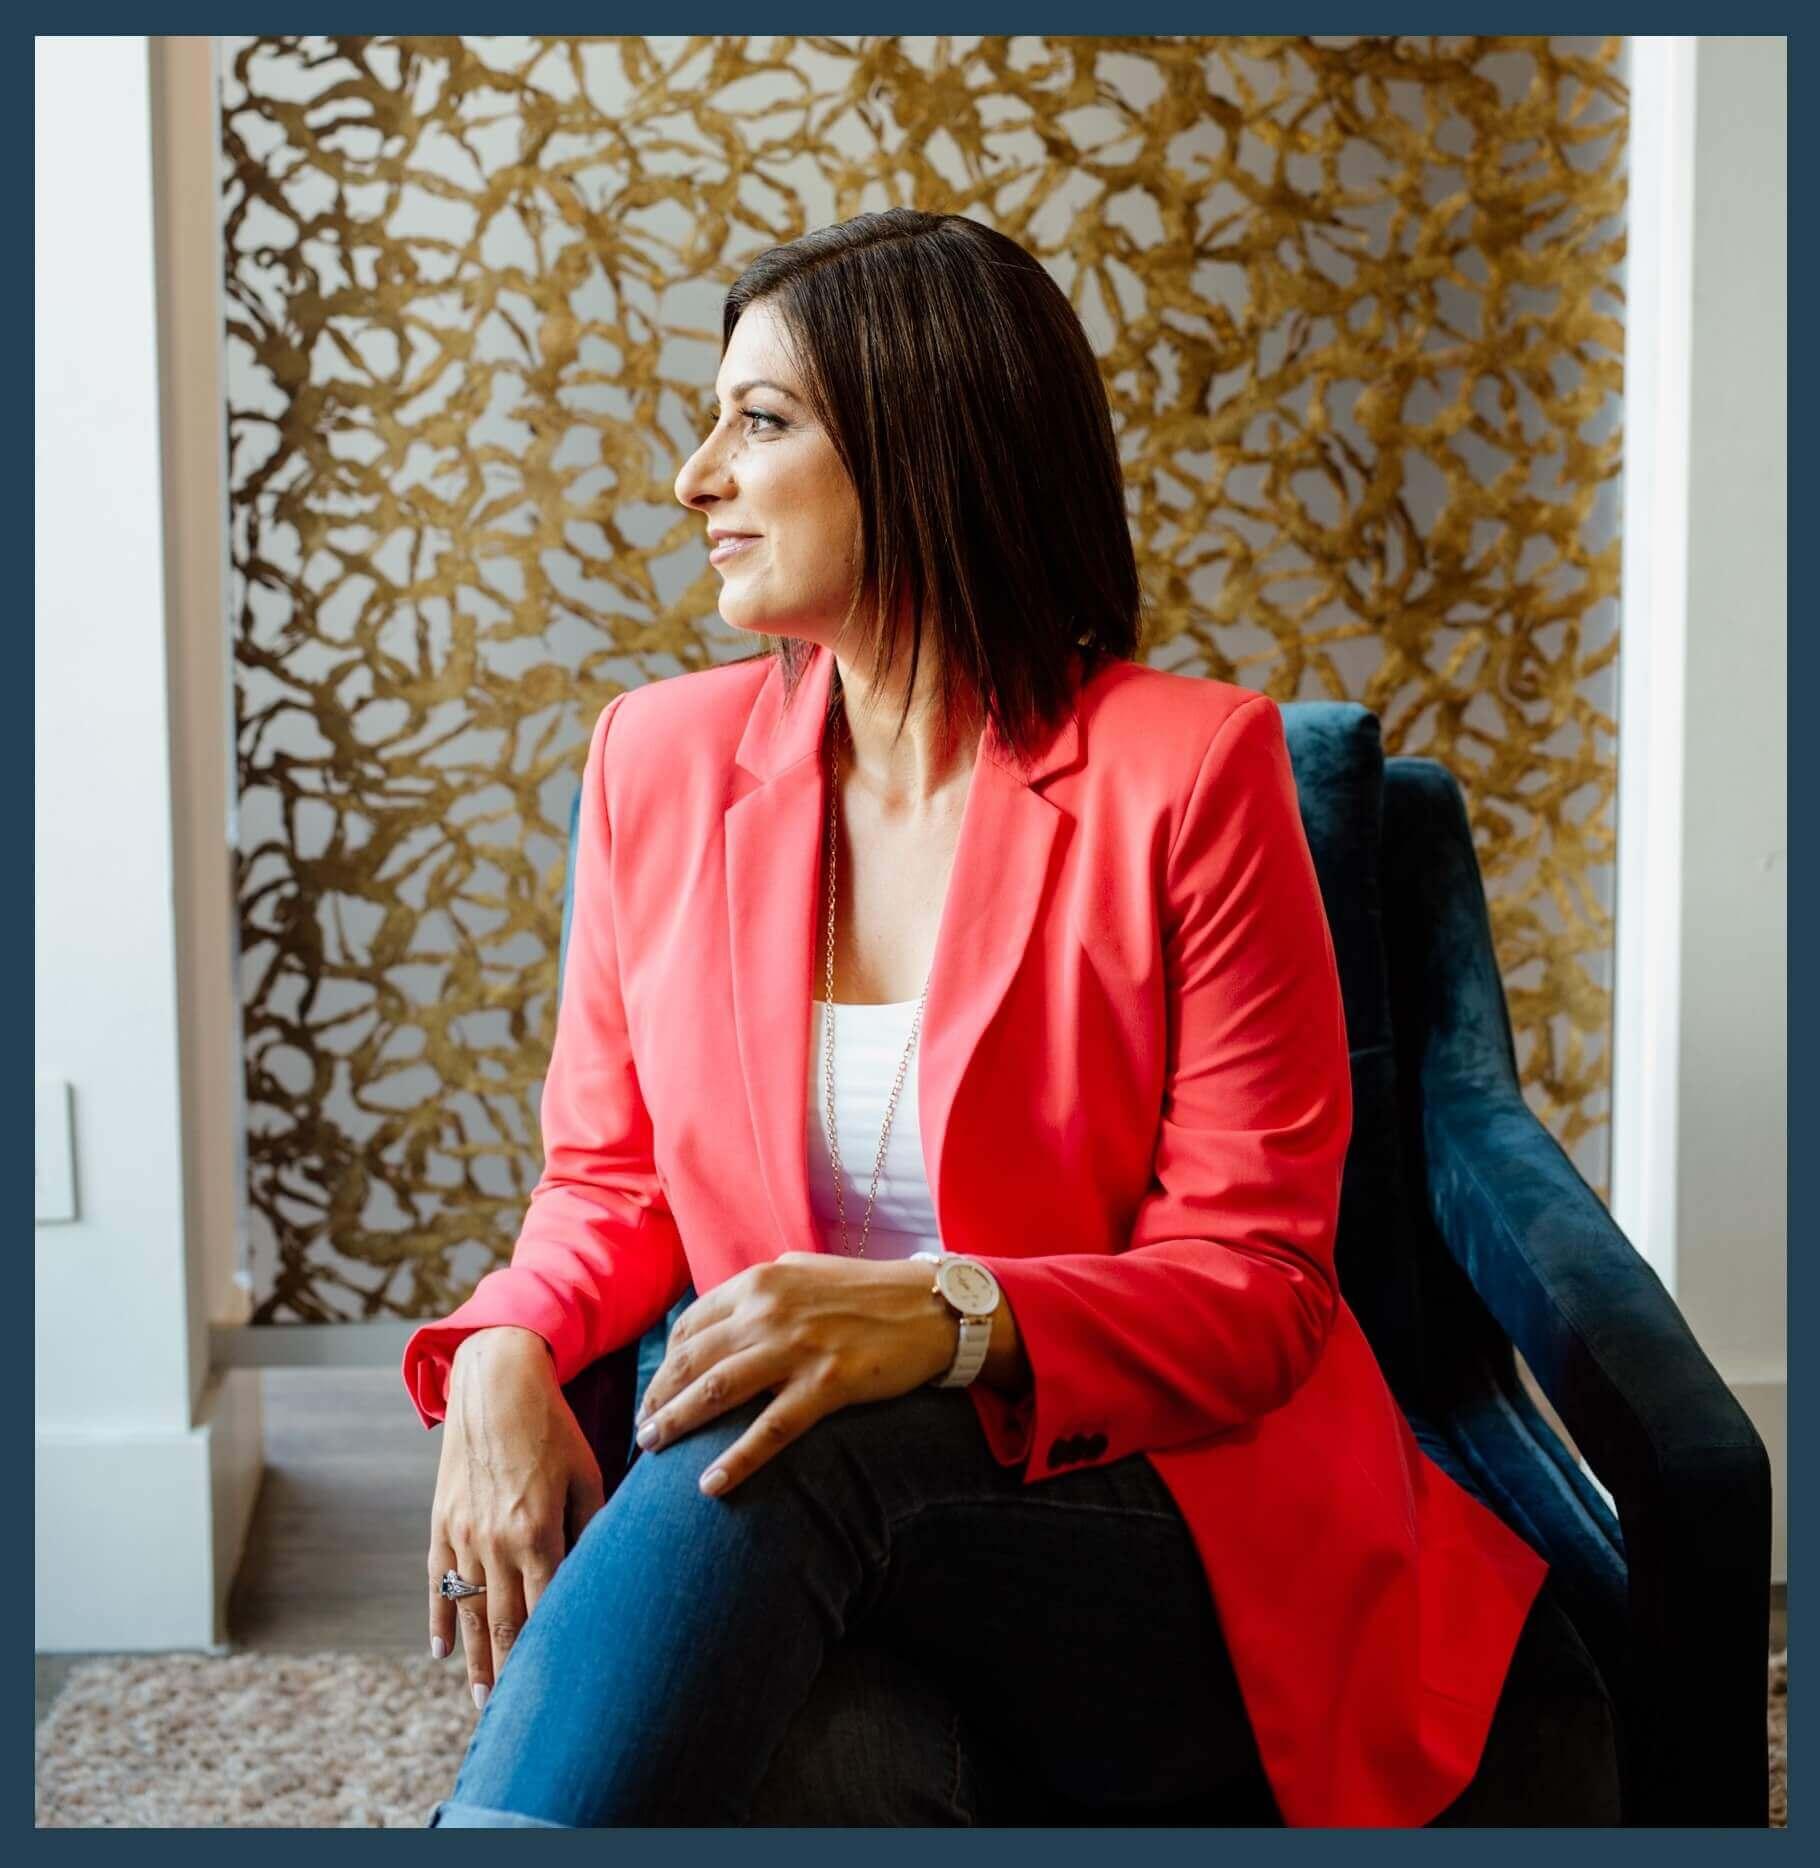 Monique Tallon, Women's Leadership & Inclusion Expert